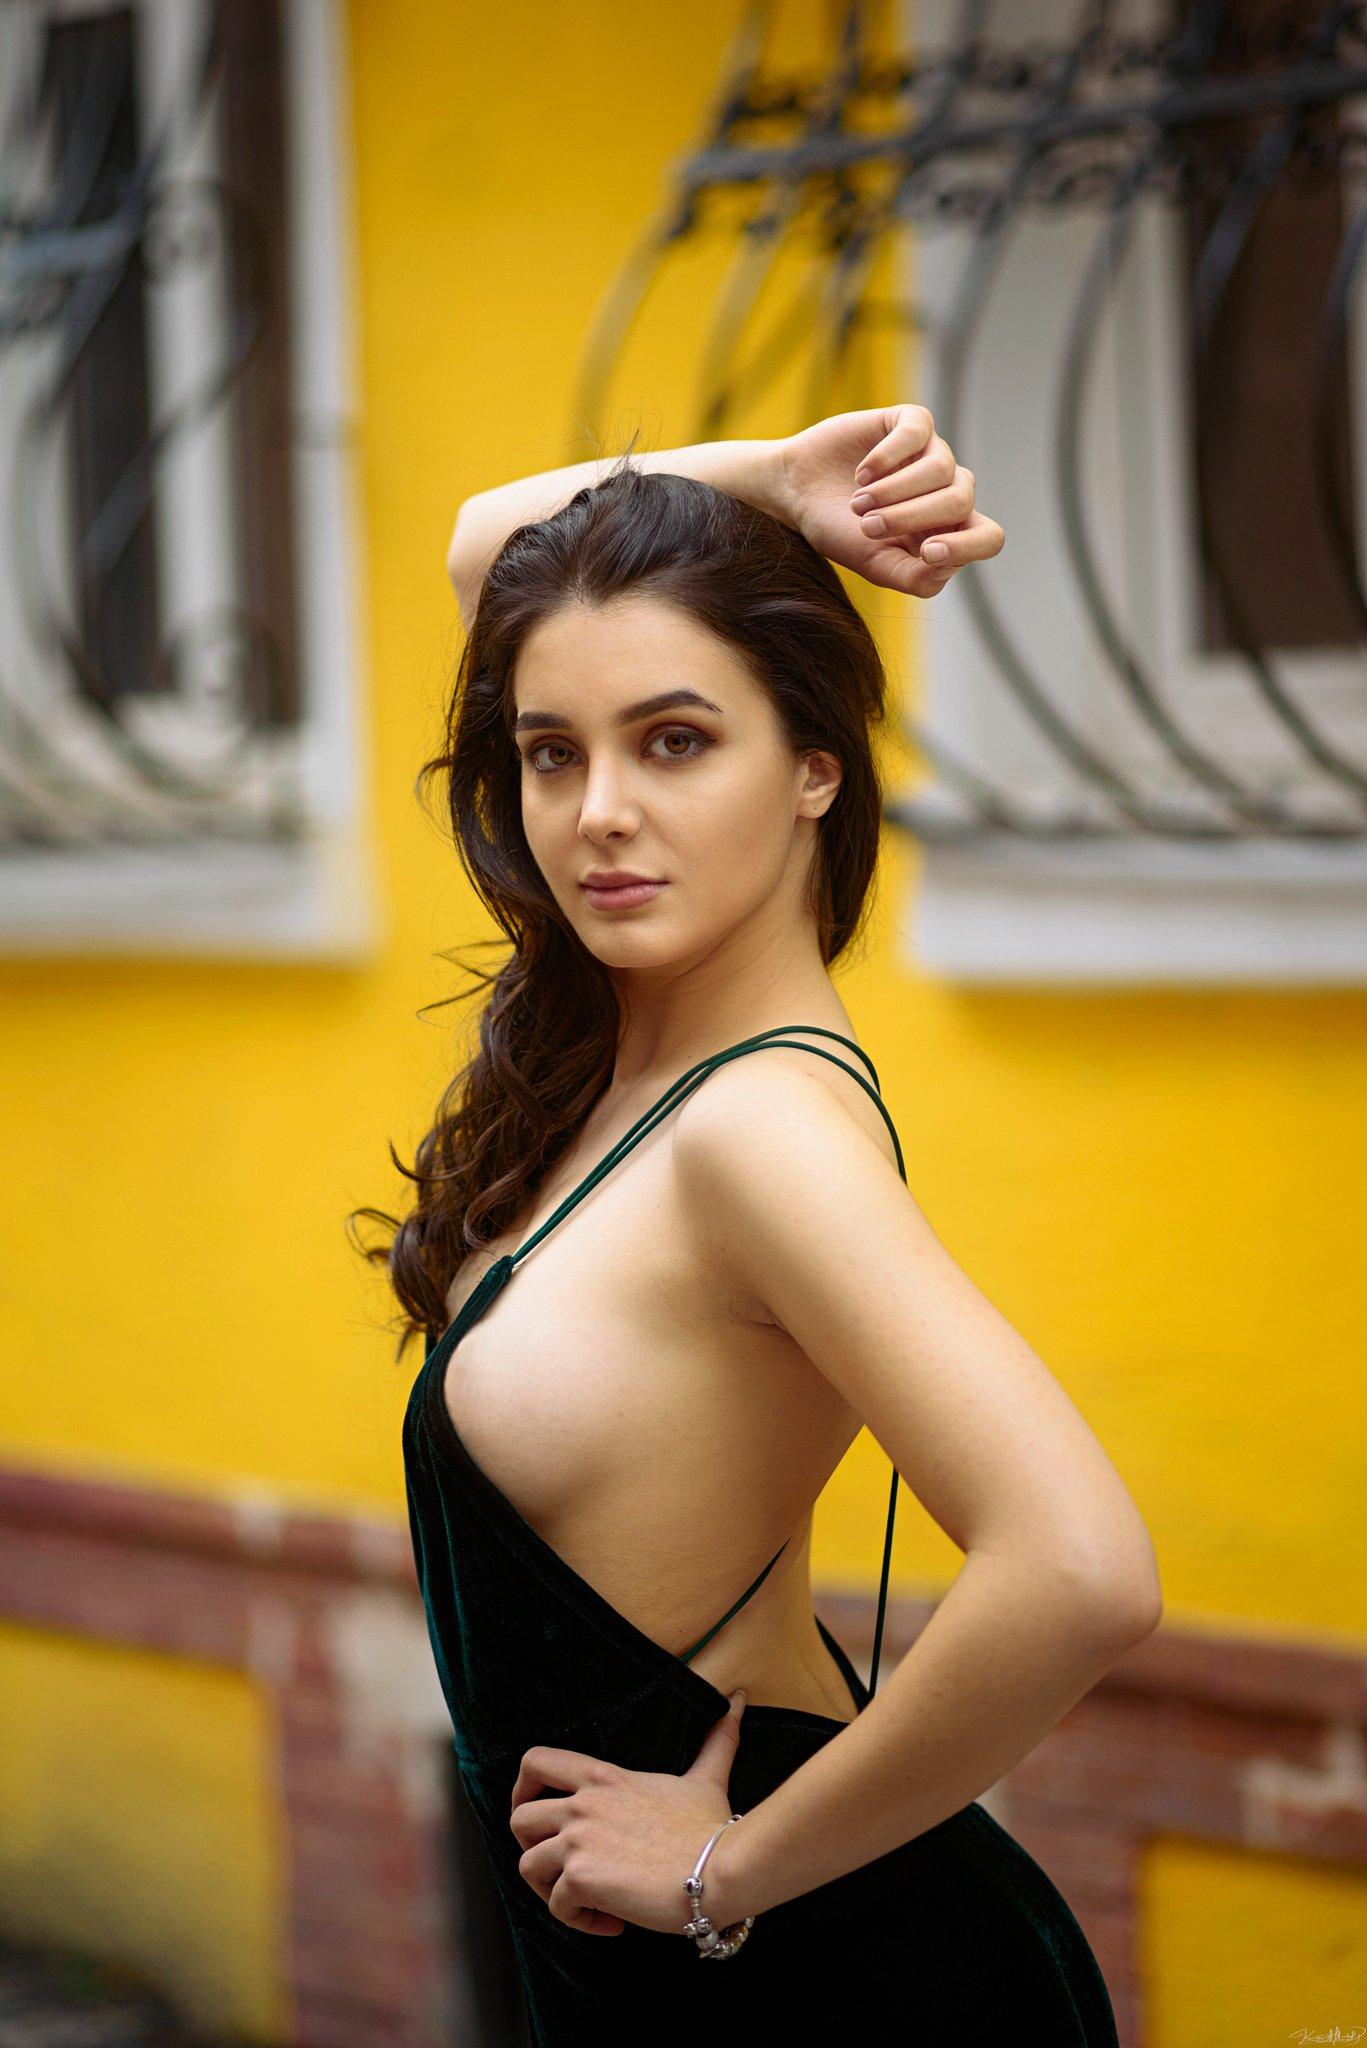 sexy, body, colorful, pretty, face, eyes, portrait, girl, female, nikon, Каан Алтындал